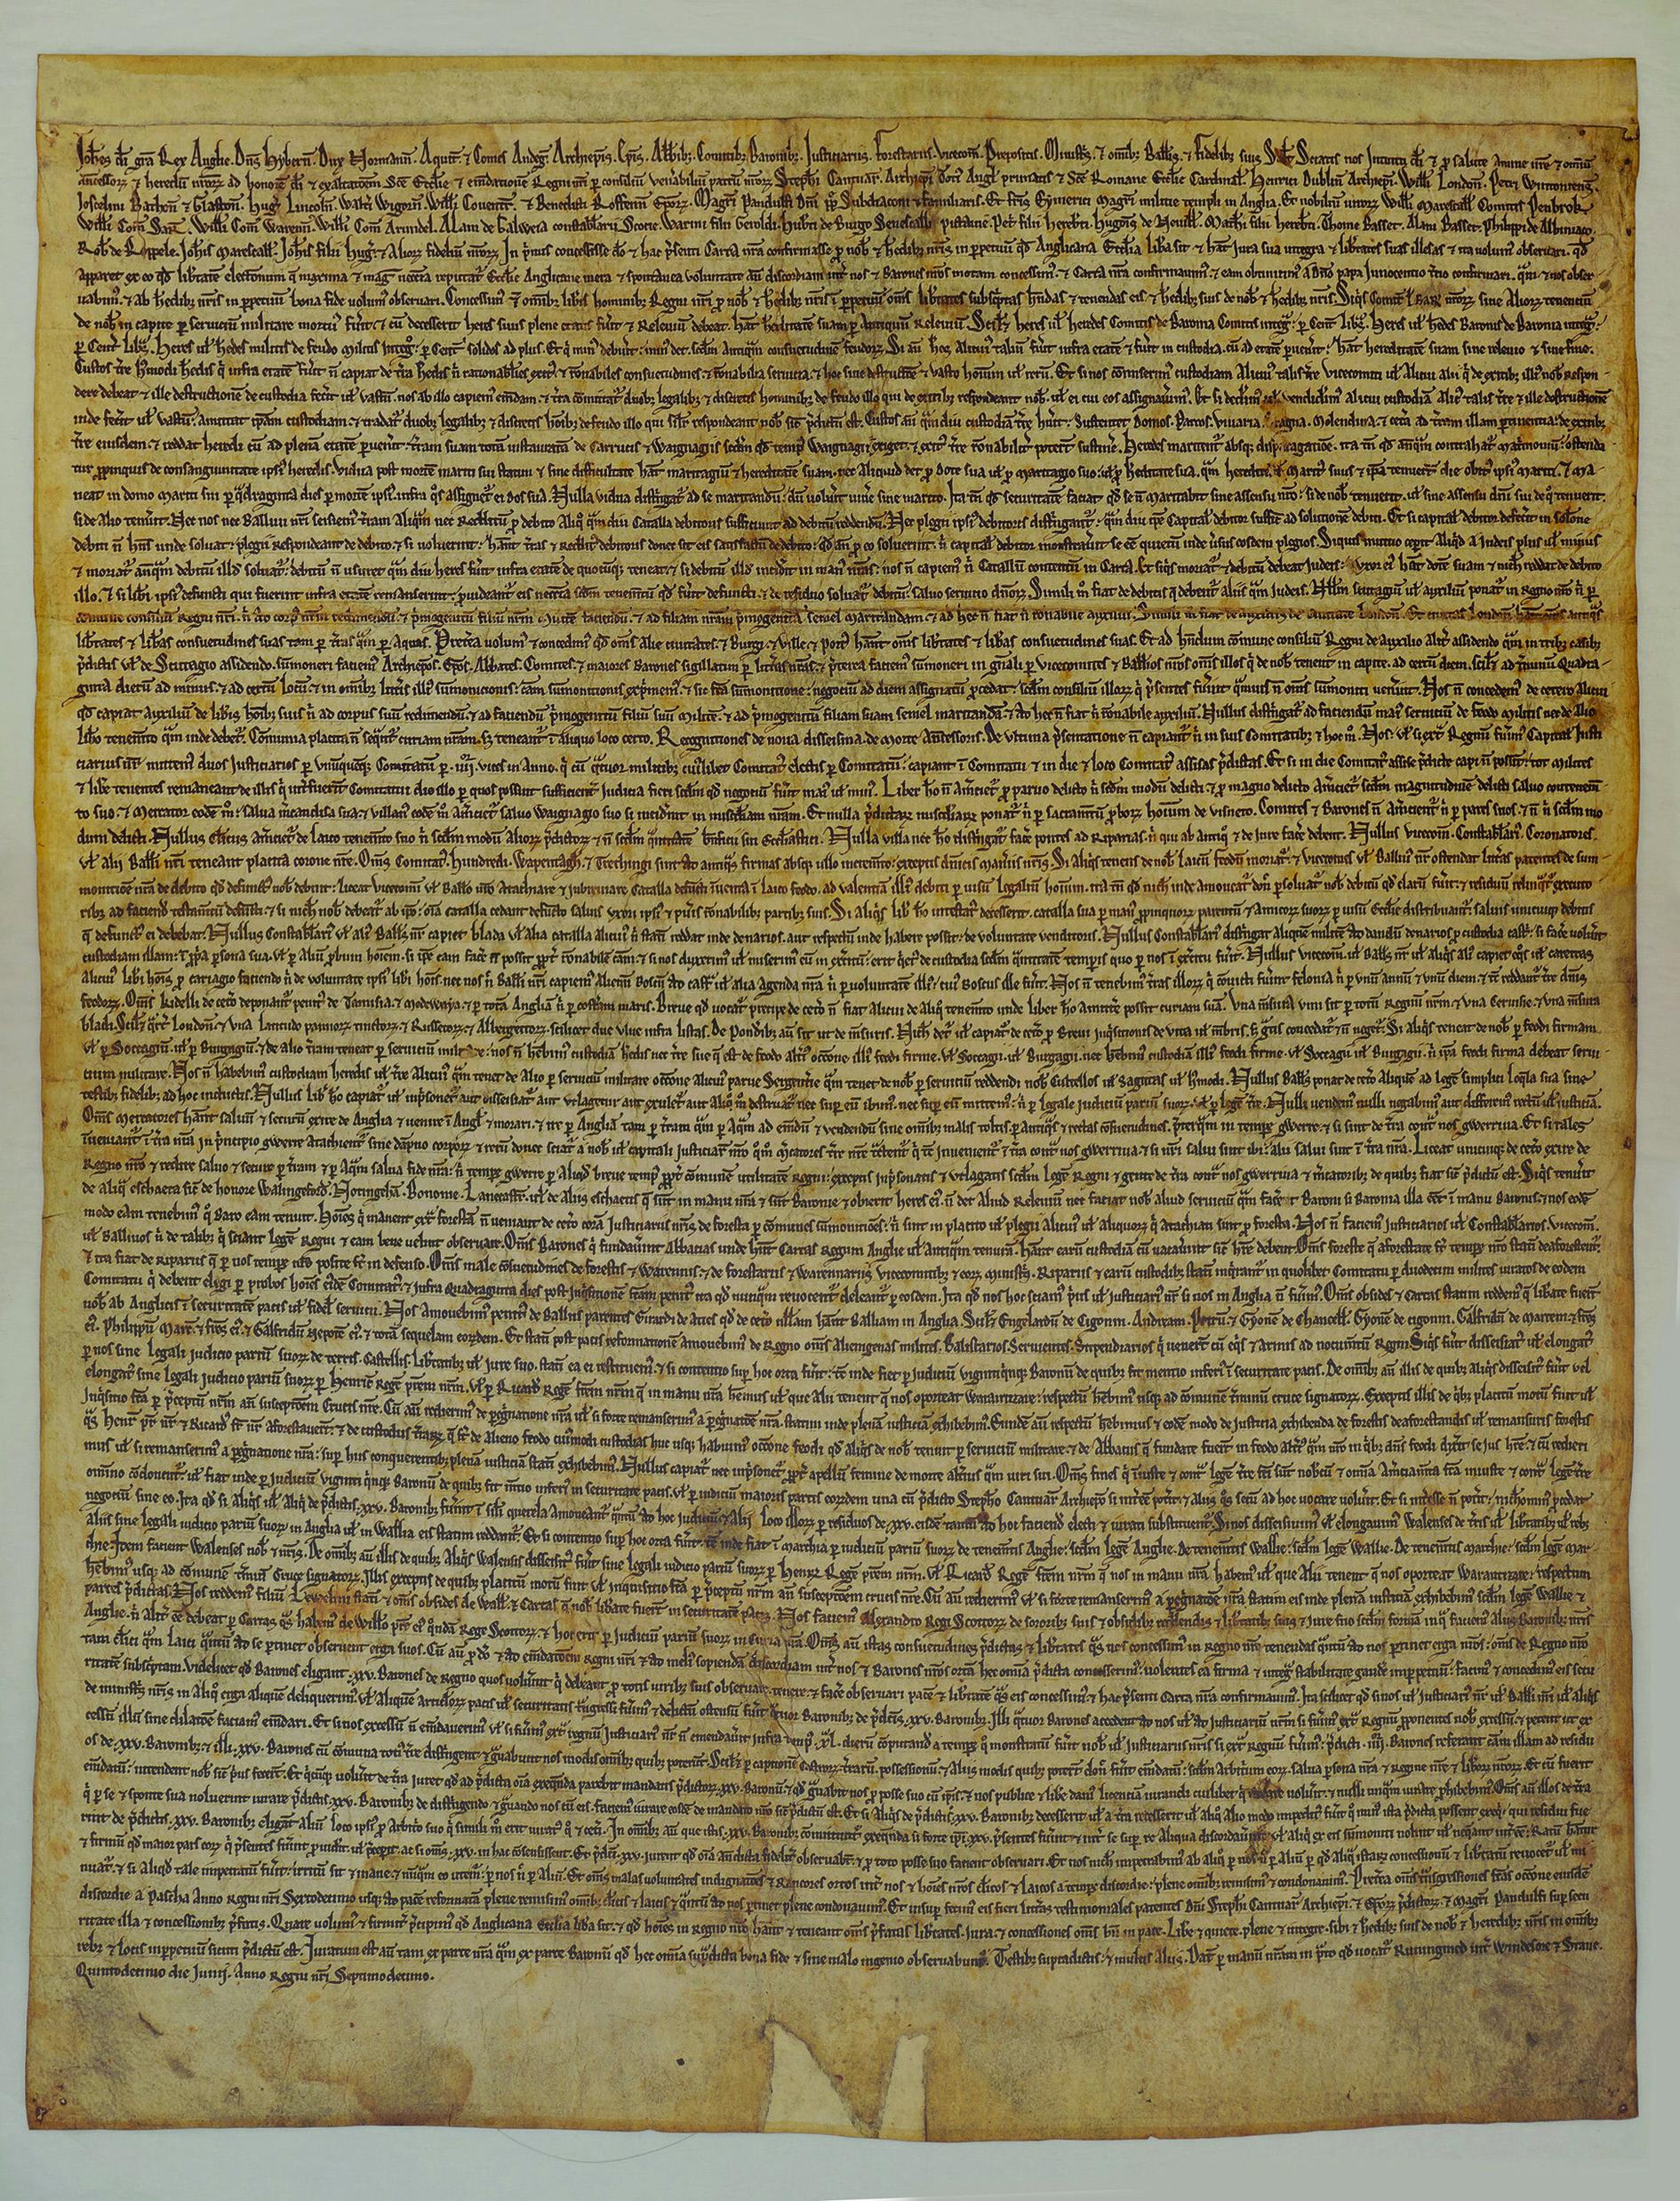 Short Essay About Magna Carta